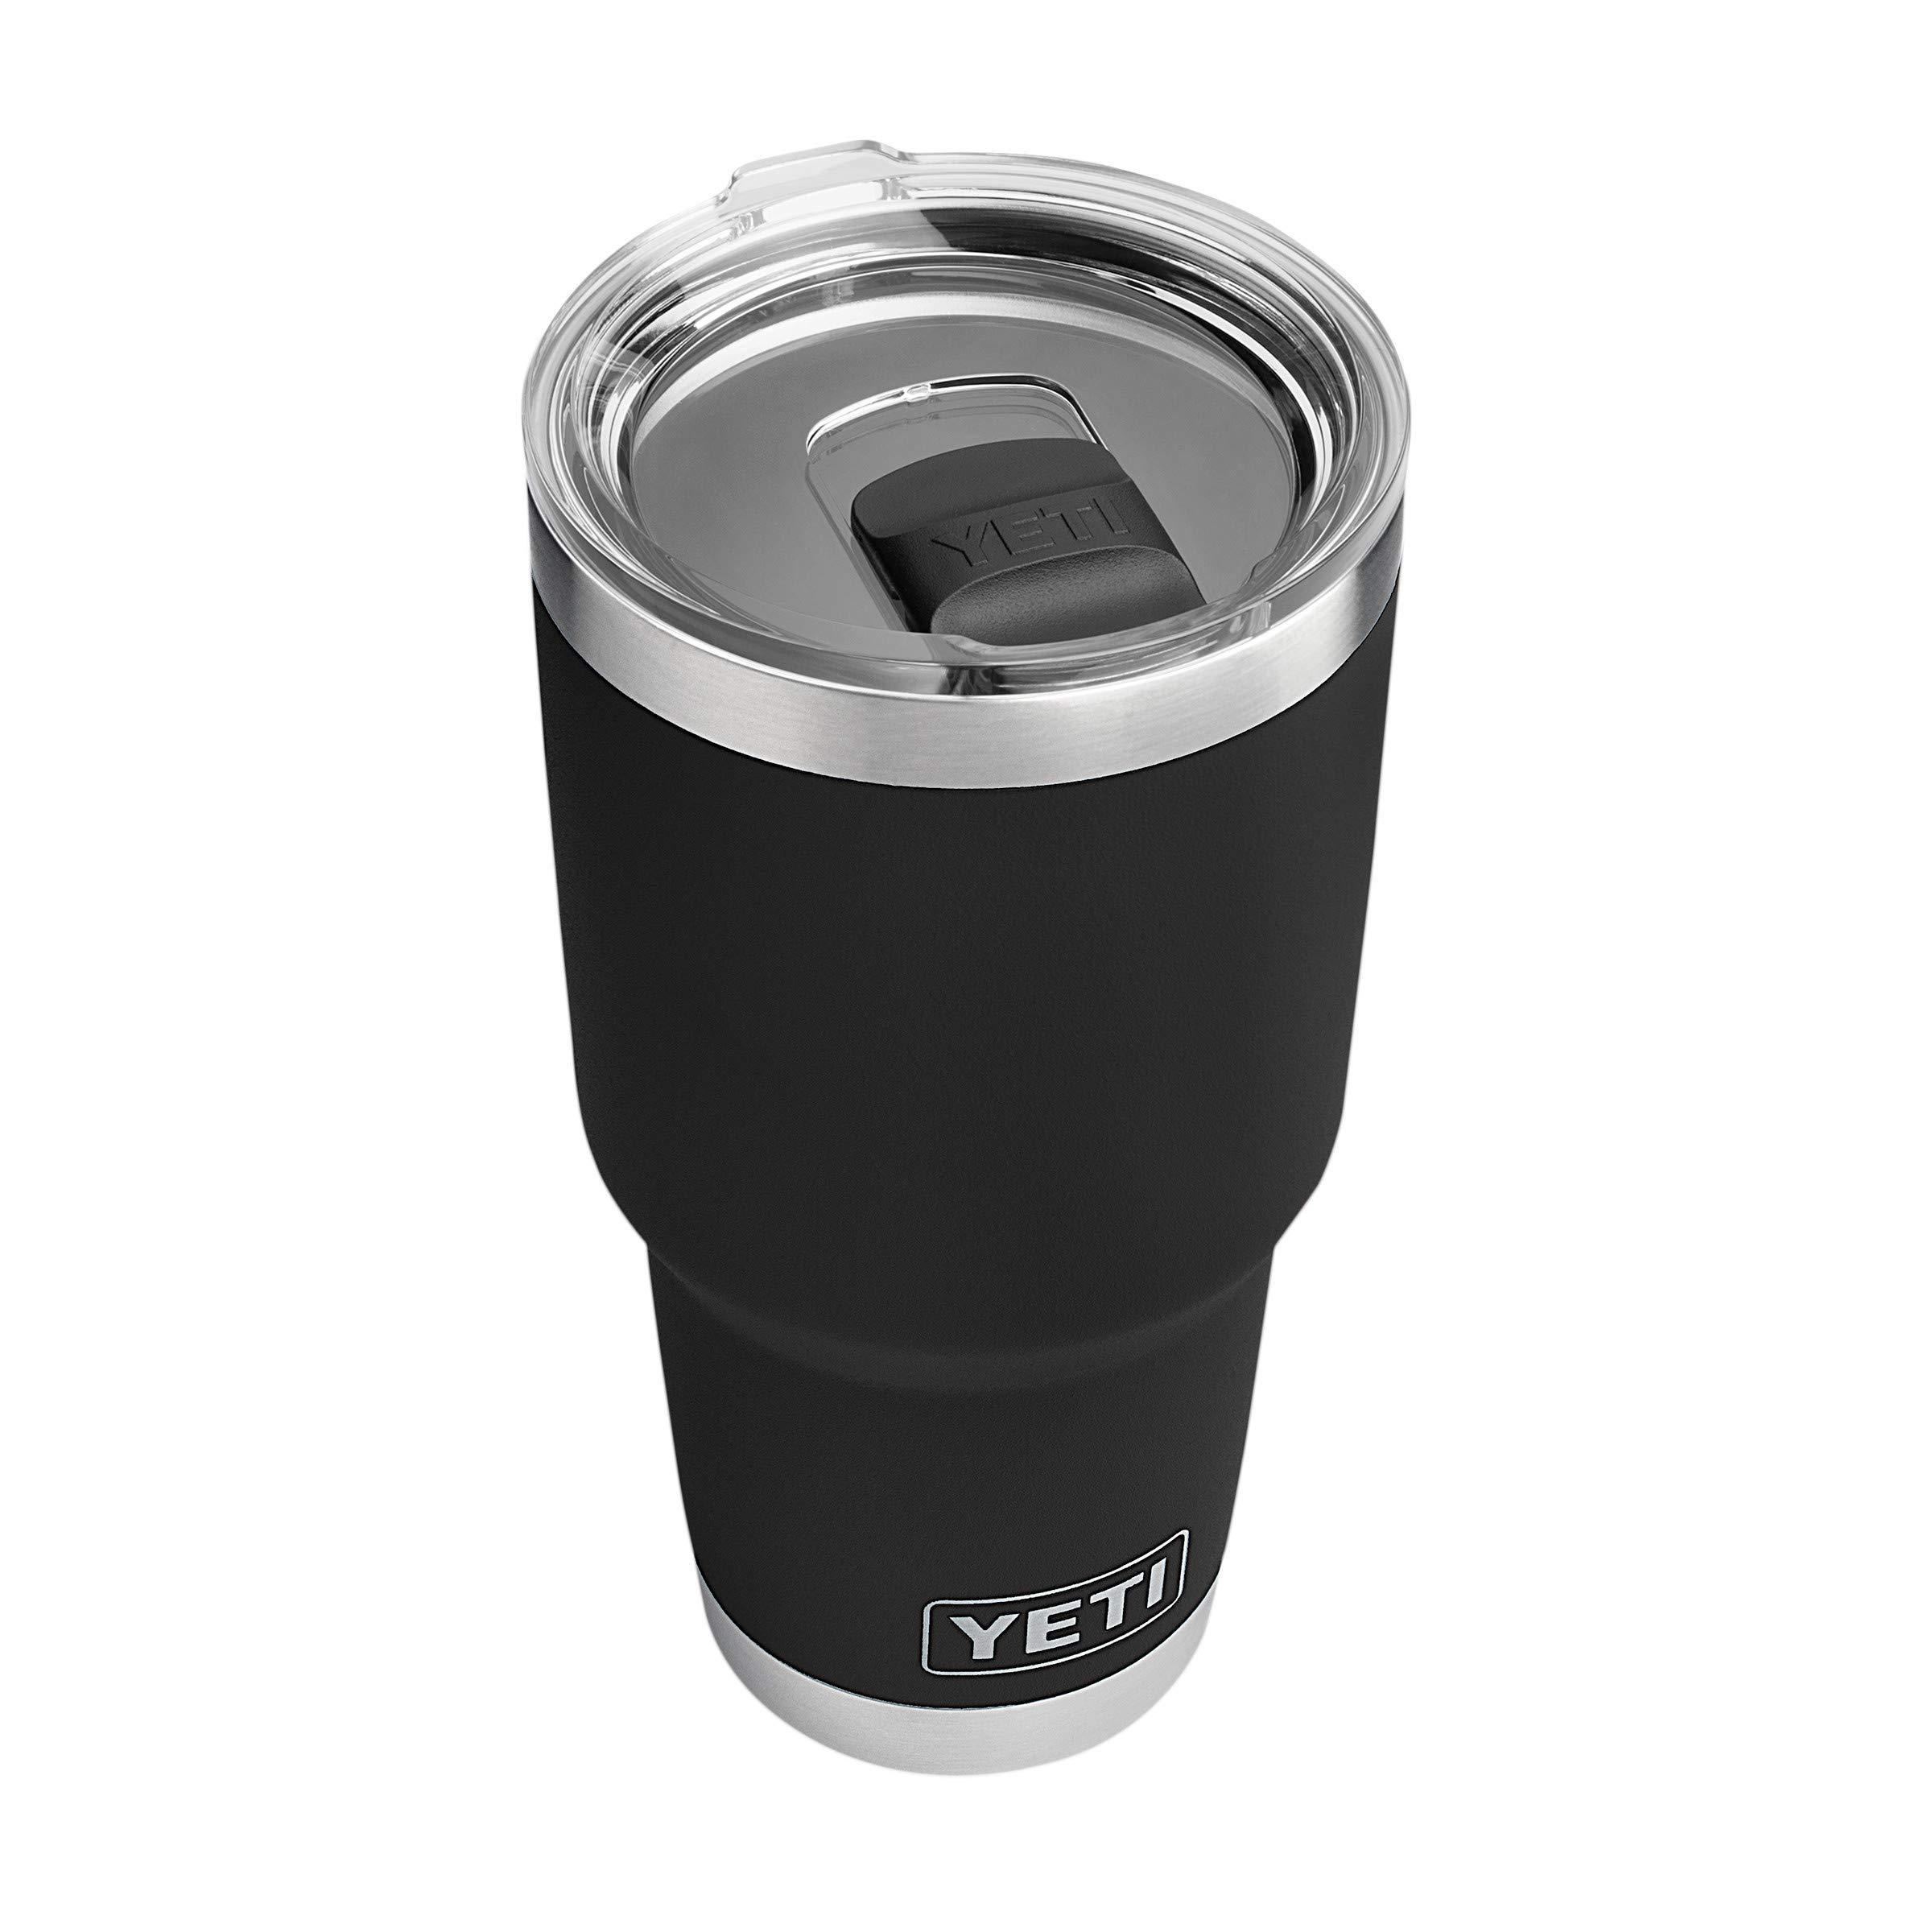 YETI Rambler 30 oz Stainless Steel Vacuum Insulated Tumbler w/MagSlider Lid, Black by YETI